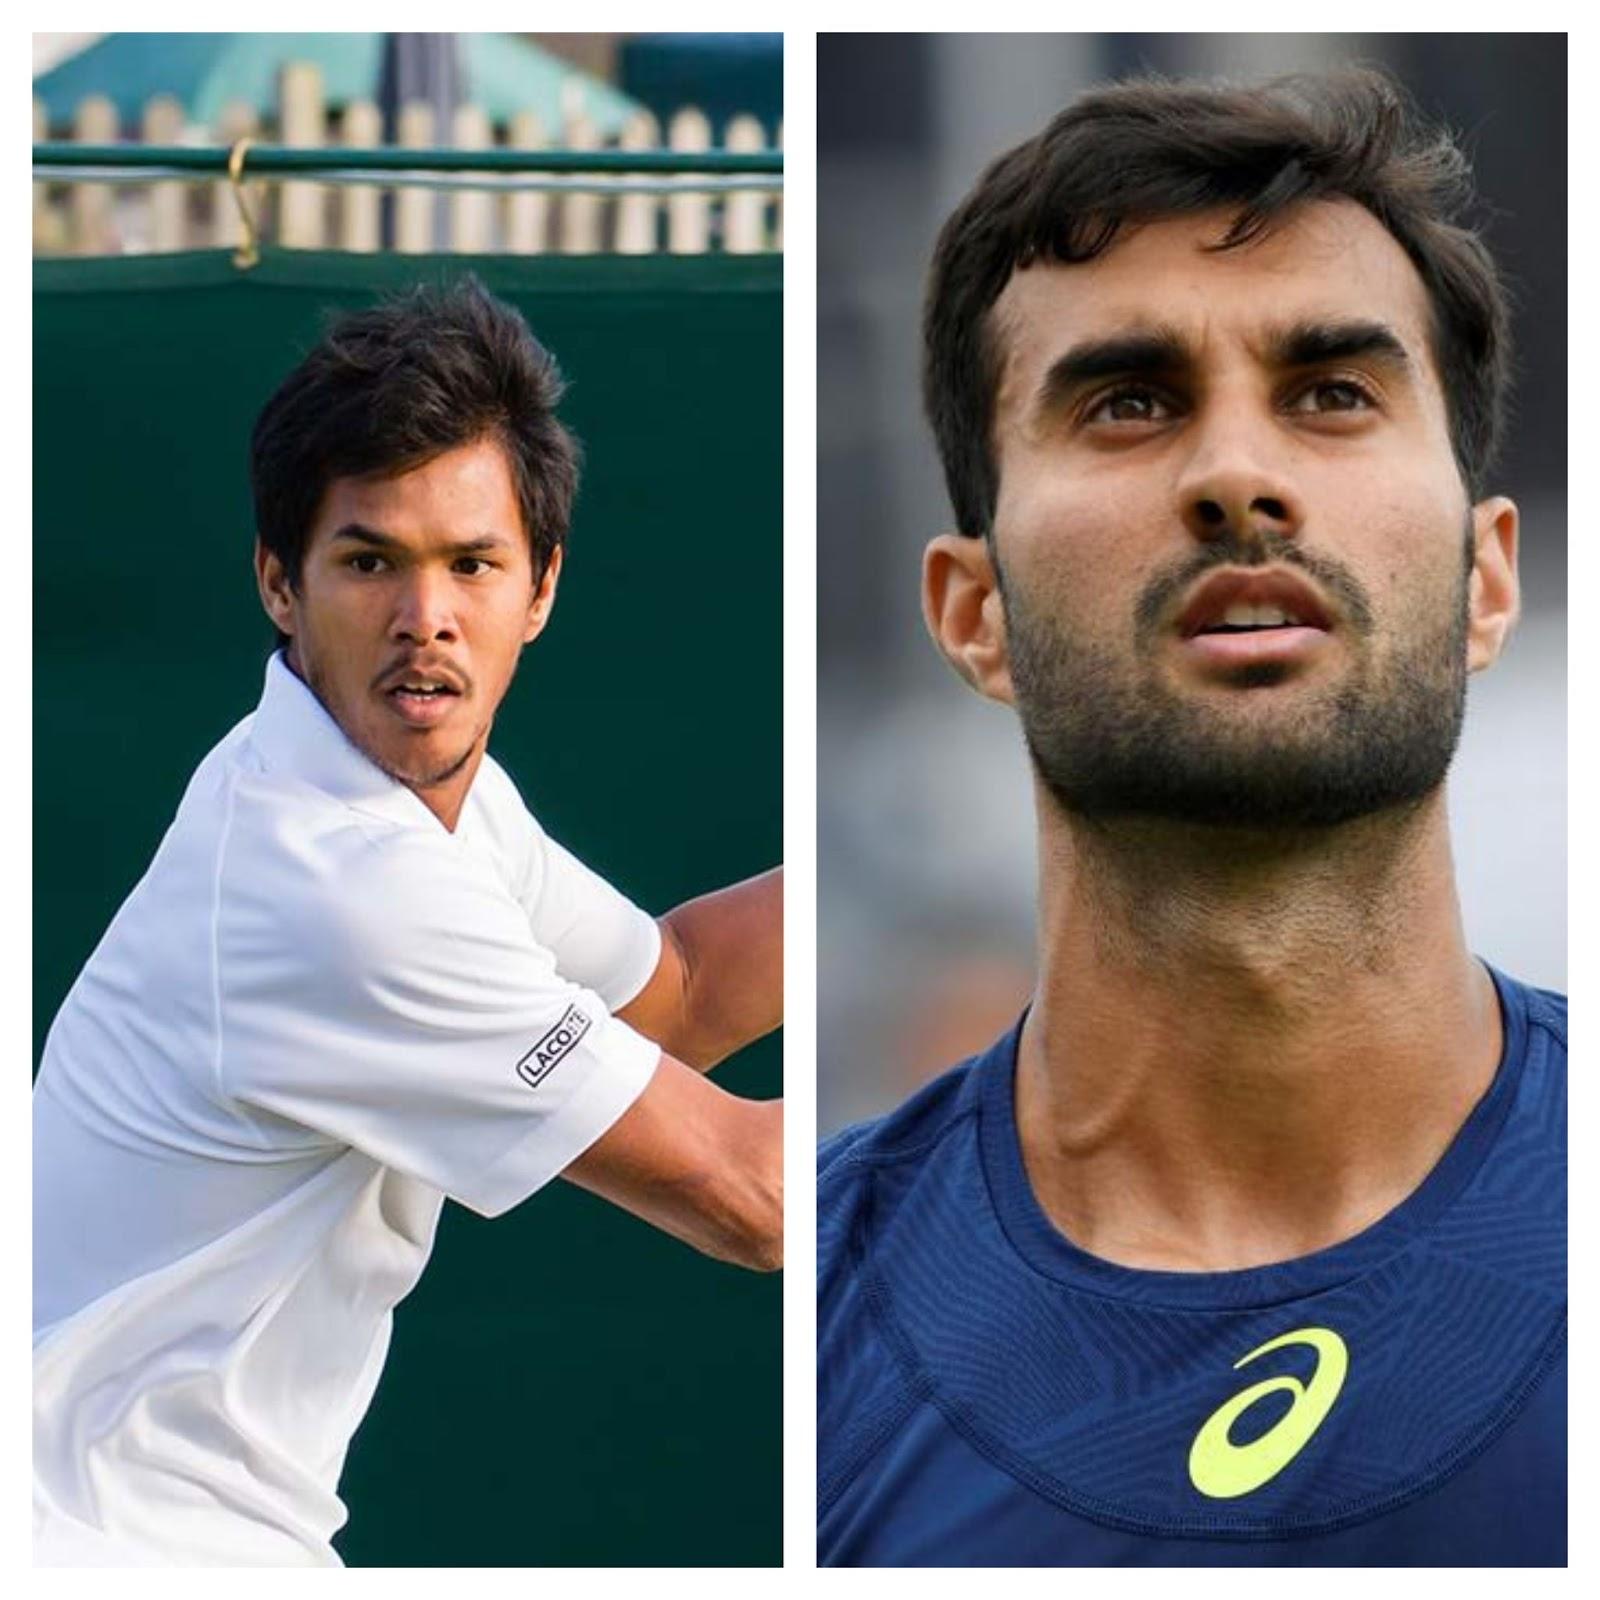 Indian tennis players Somdev Devvarman and Yuki Bhambri